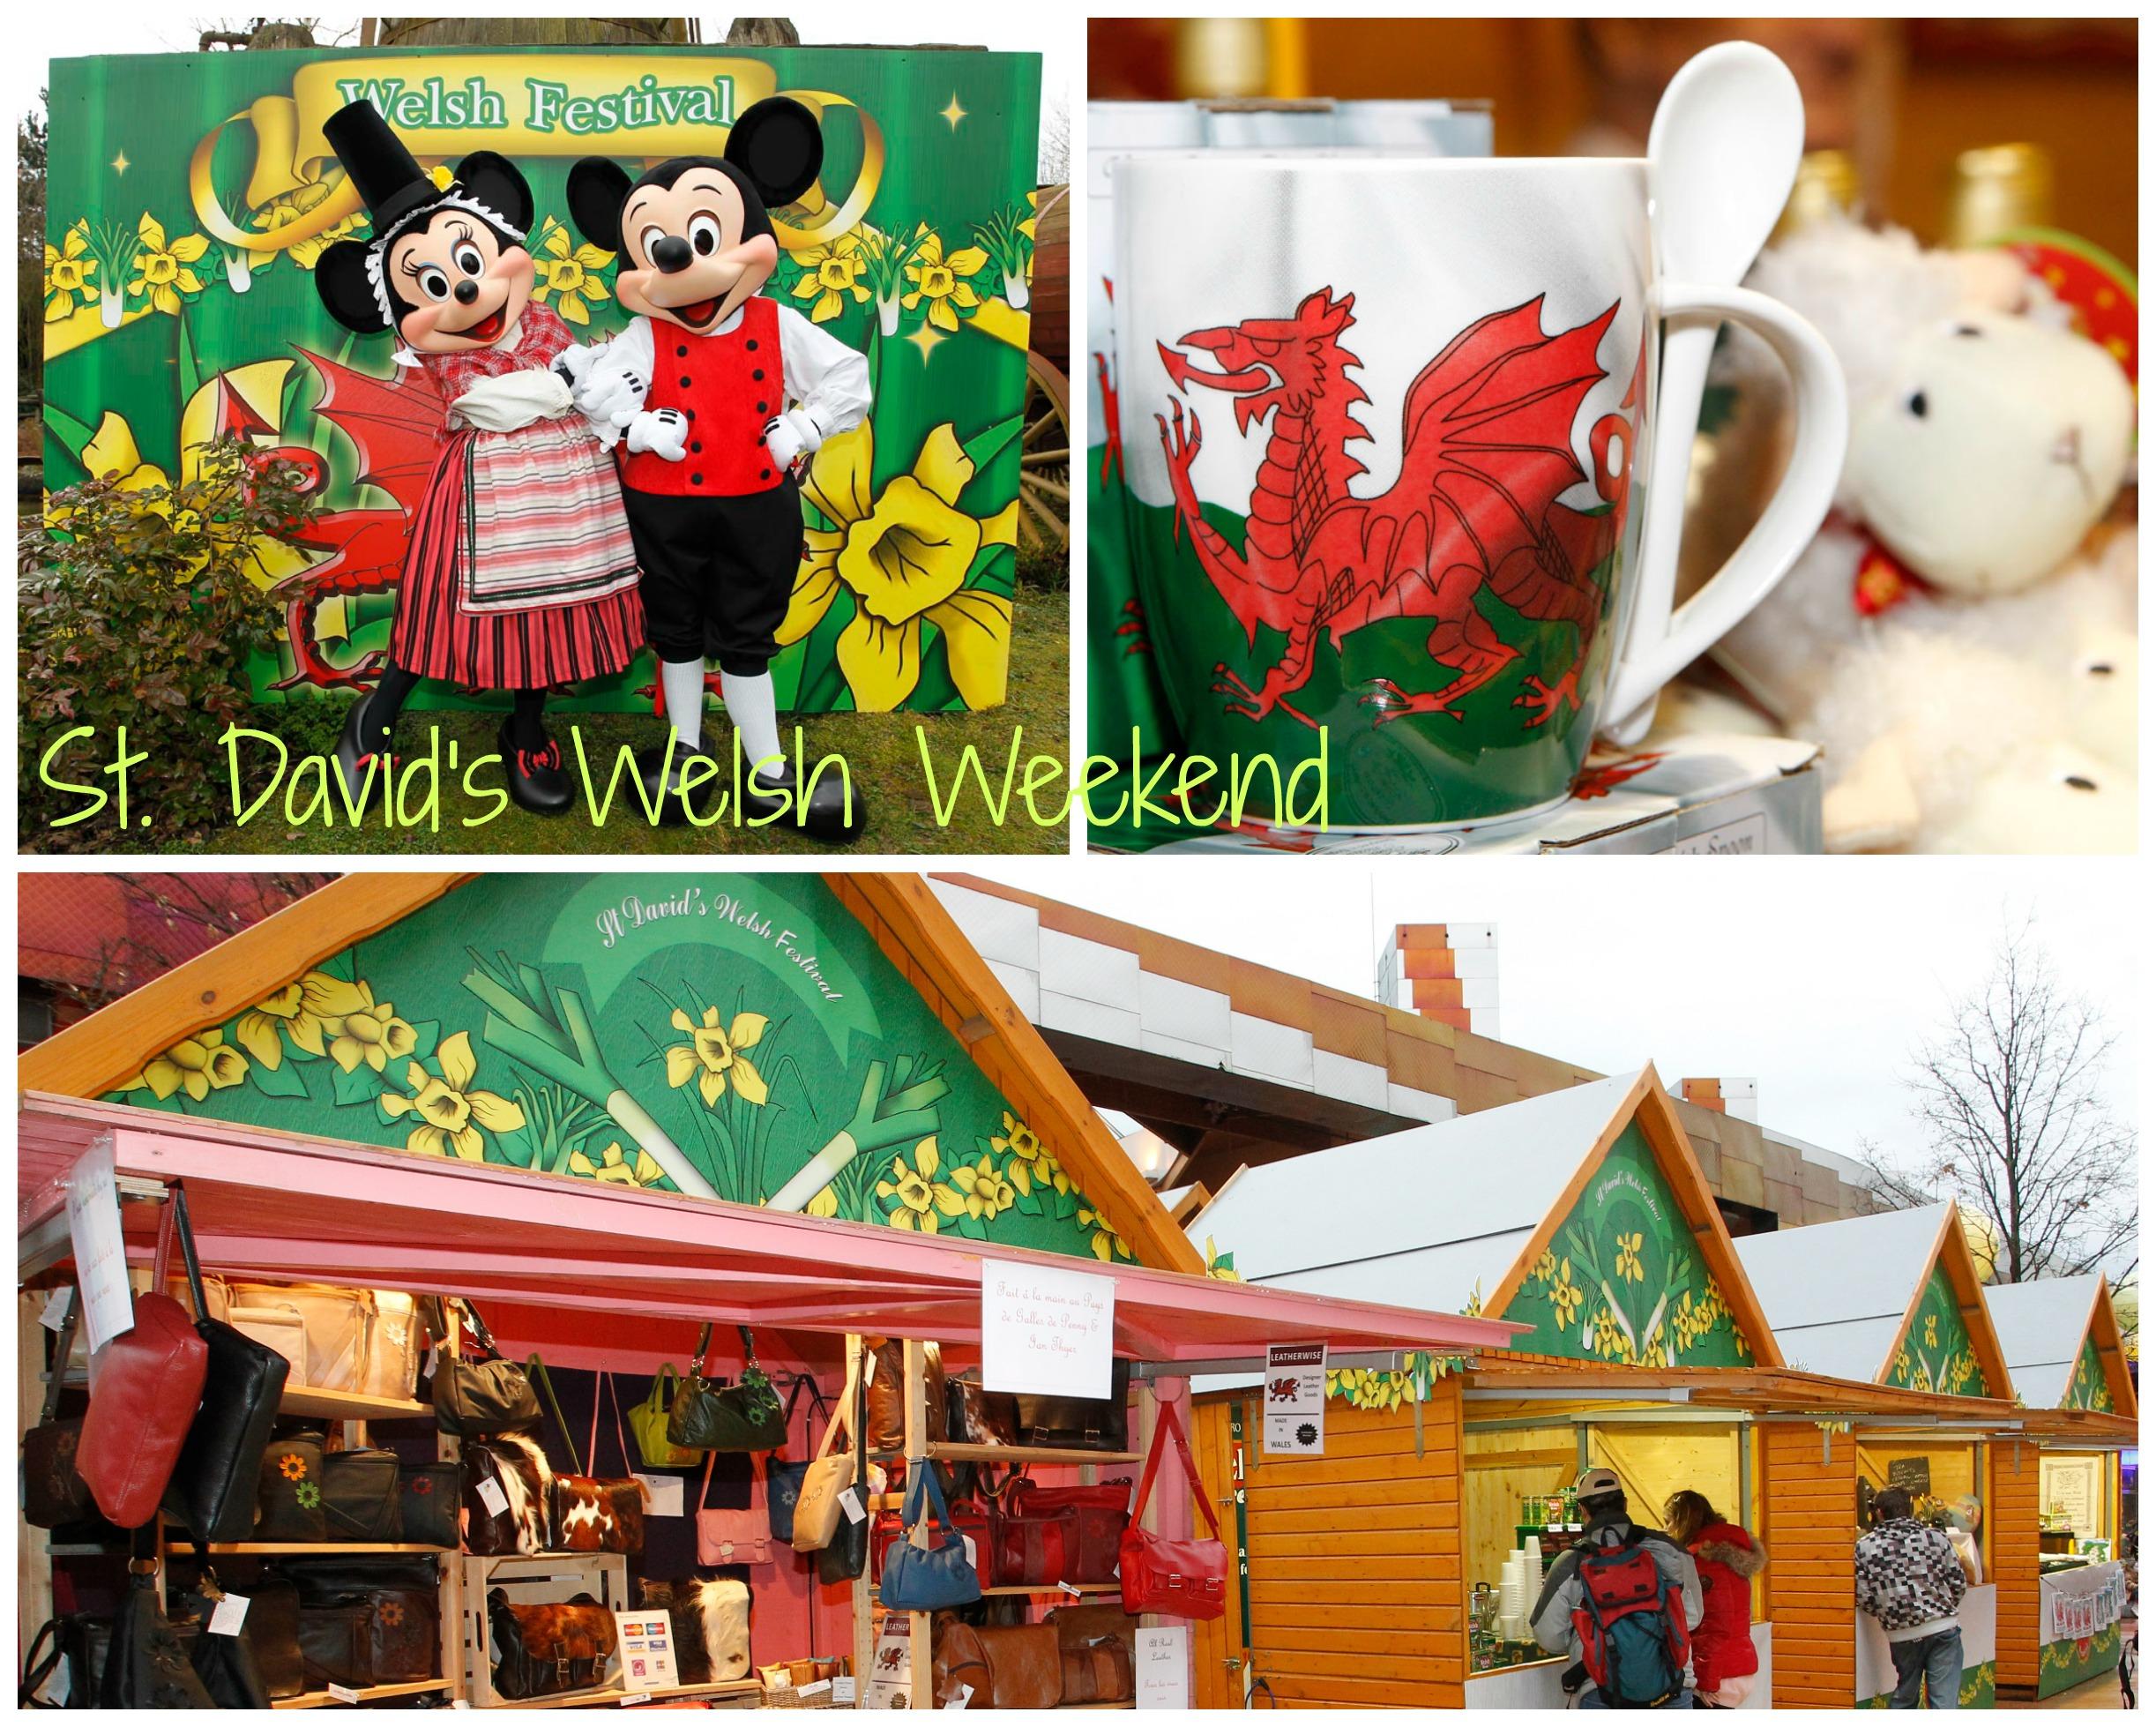 St David's Welsh Weekend at Disneyland Paris